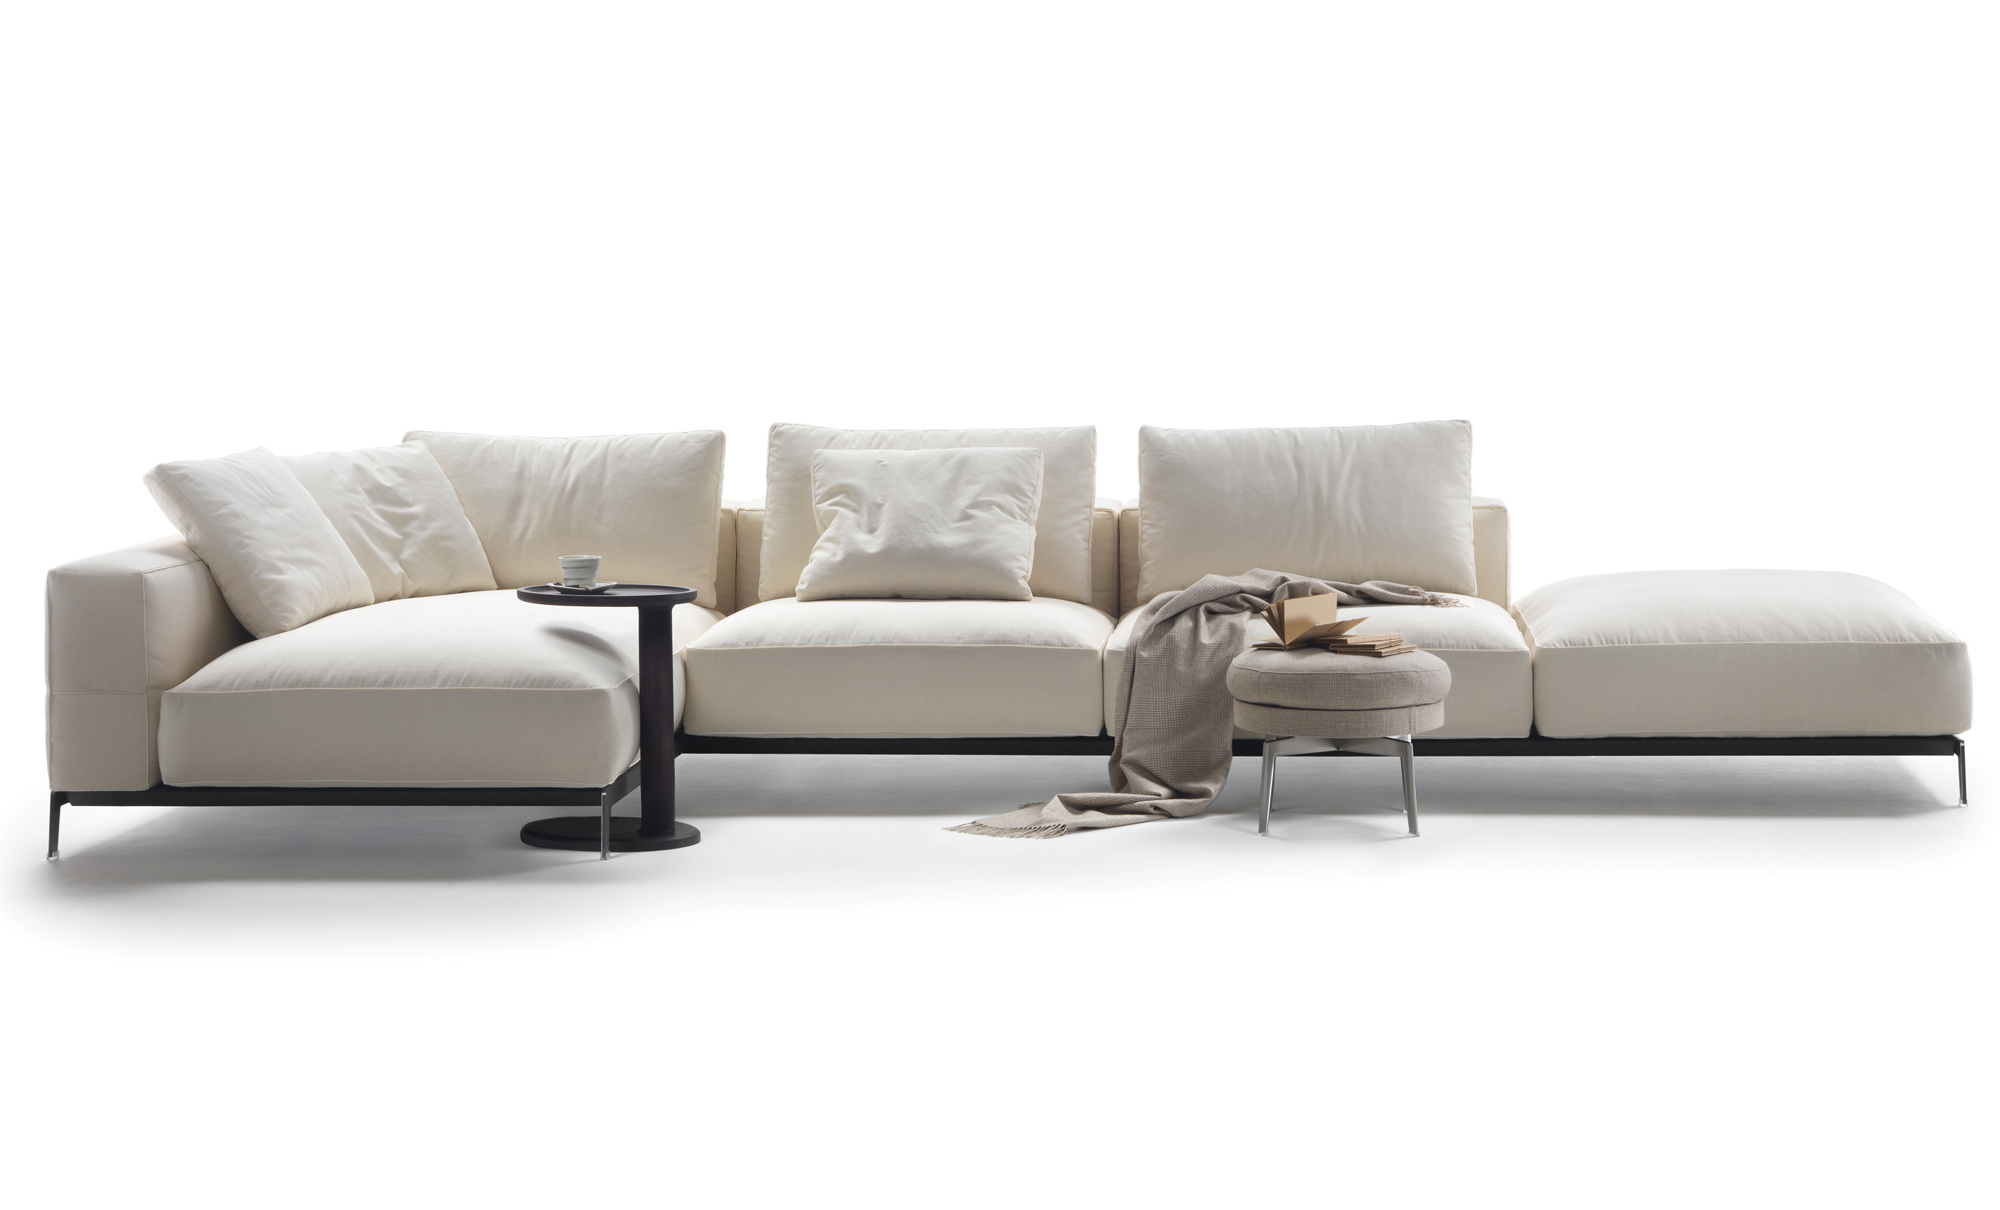 Ettore modular sofa Fanuli Furniture